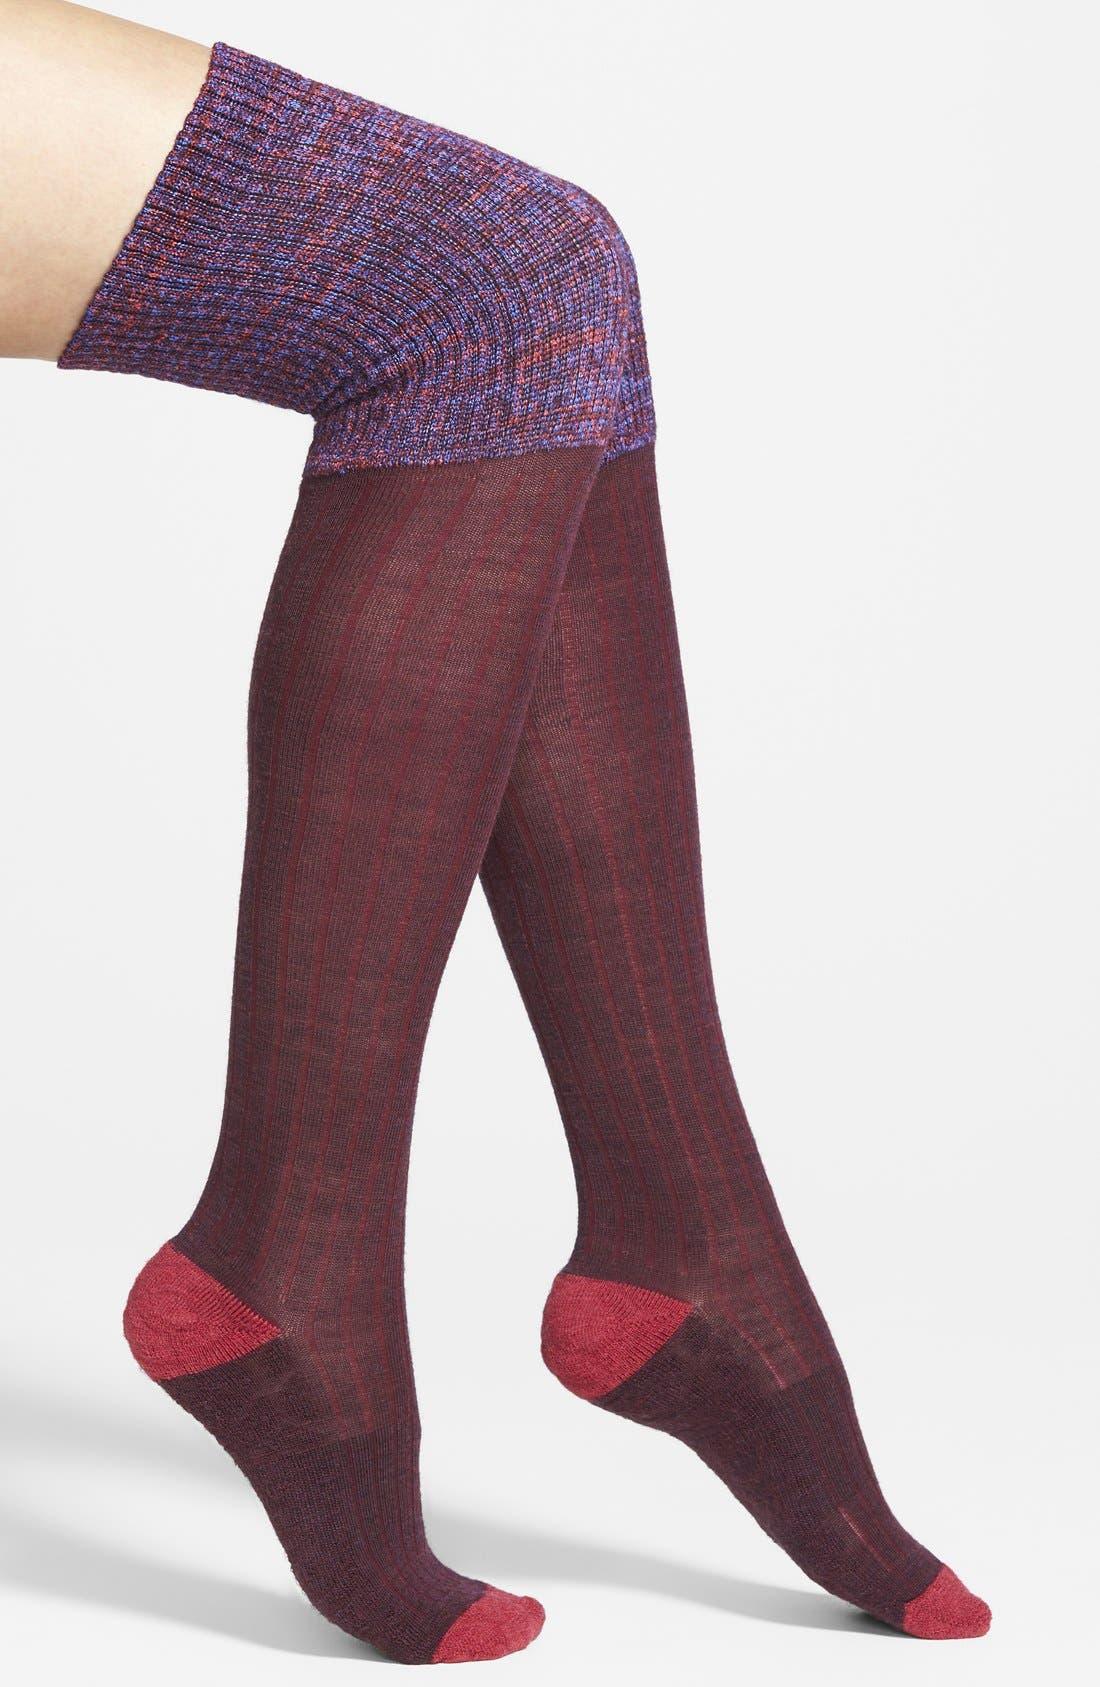 Alternate Image 1 Selected - Smartwool Over the Knee Socks